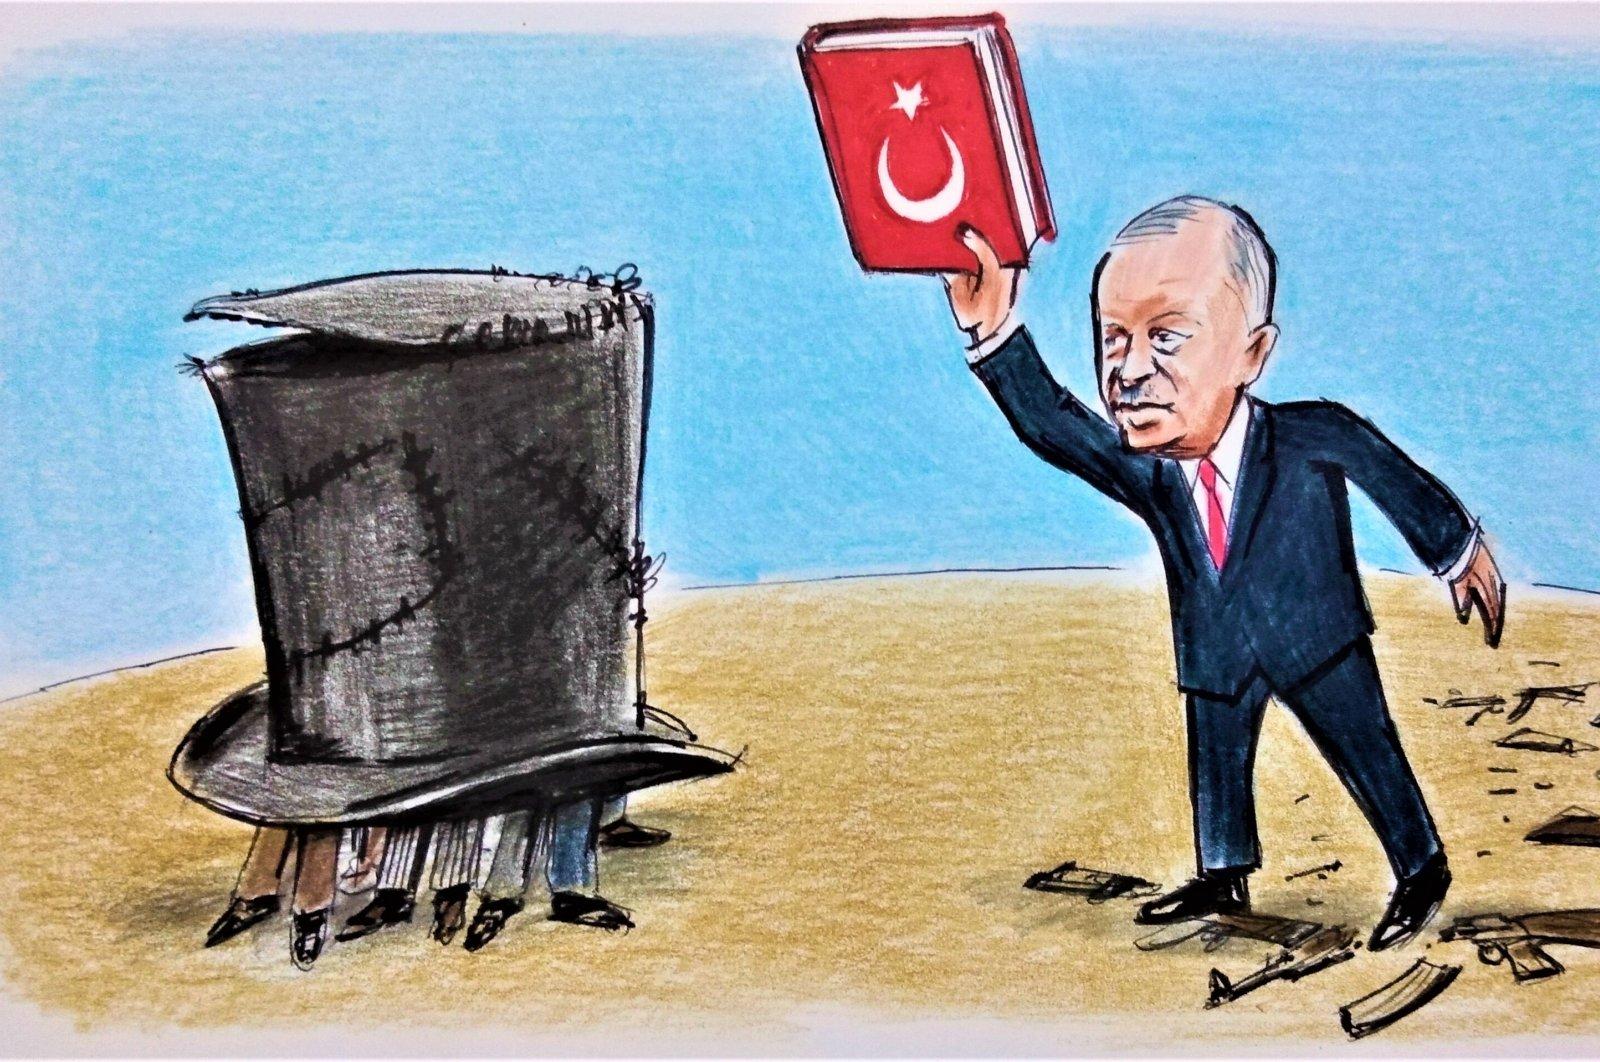 Illustration by Erhan Yalvaç.